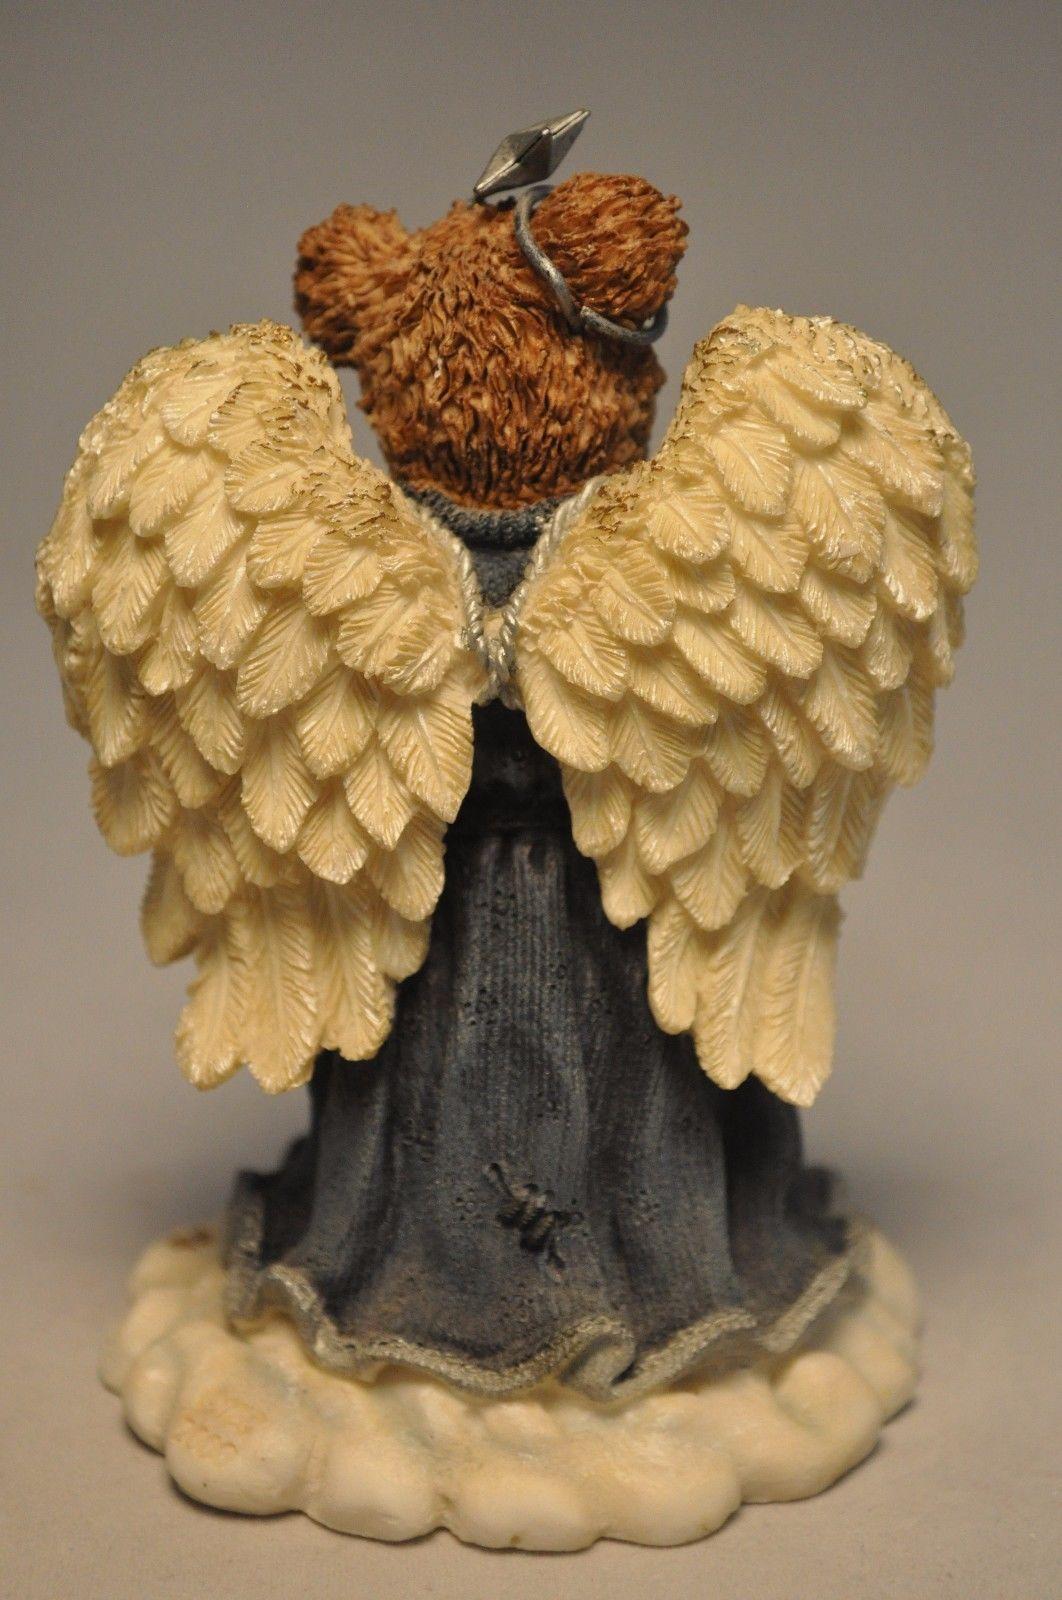 Boyds Bears & Friends: Charity Angelhug & Everychild... 228343 Cherish The Child image 10